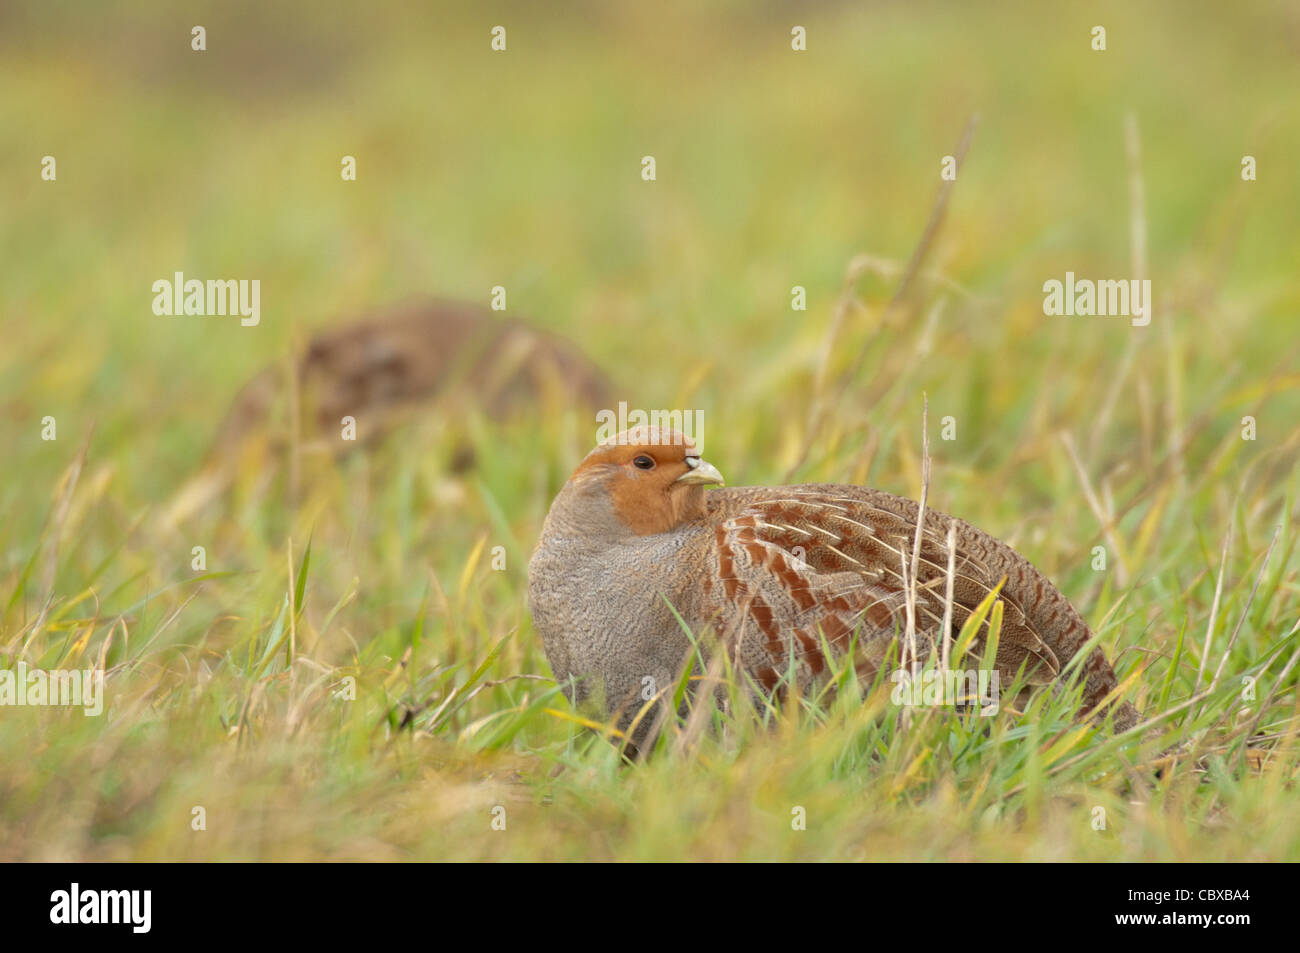 English or Grey Partridge(Perdix perdix) feeding in weedy field. - Stock Image